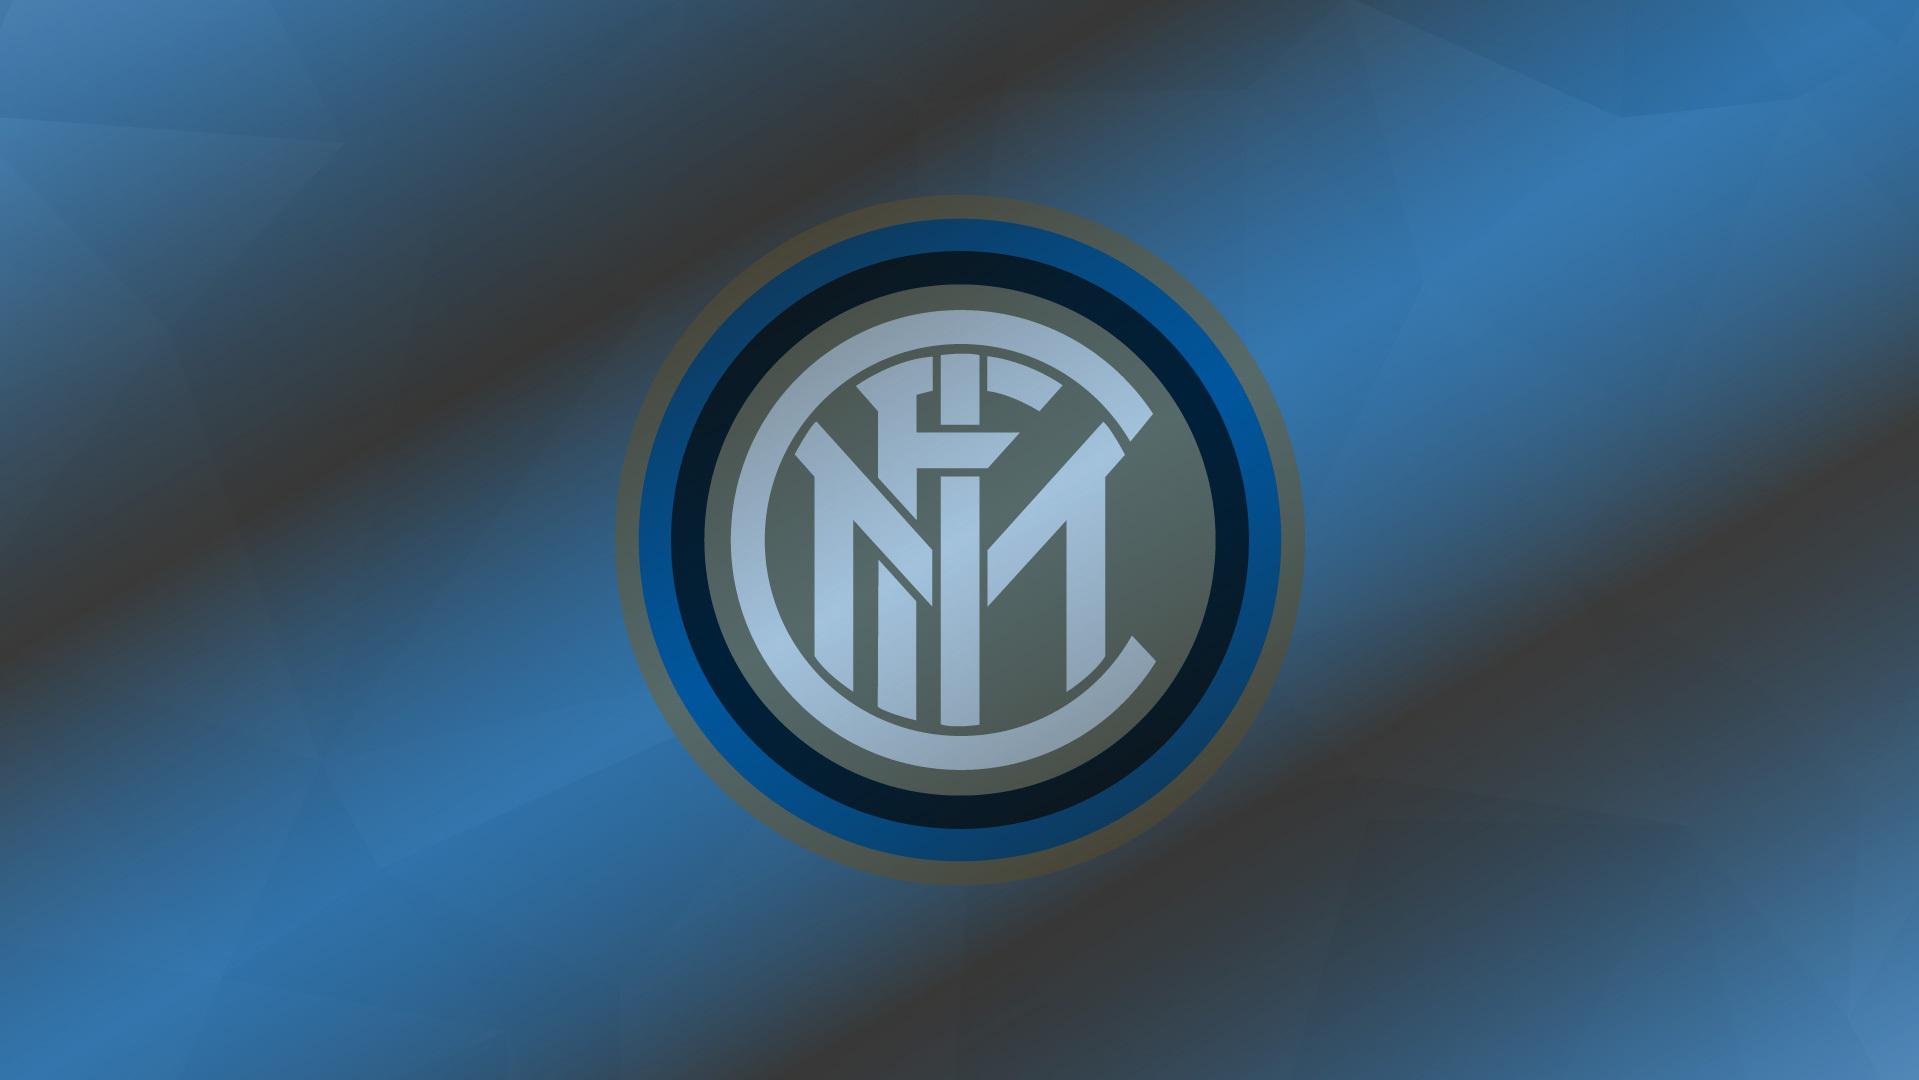 Inter Campagna 2018-2019